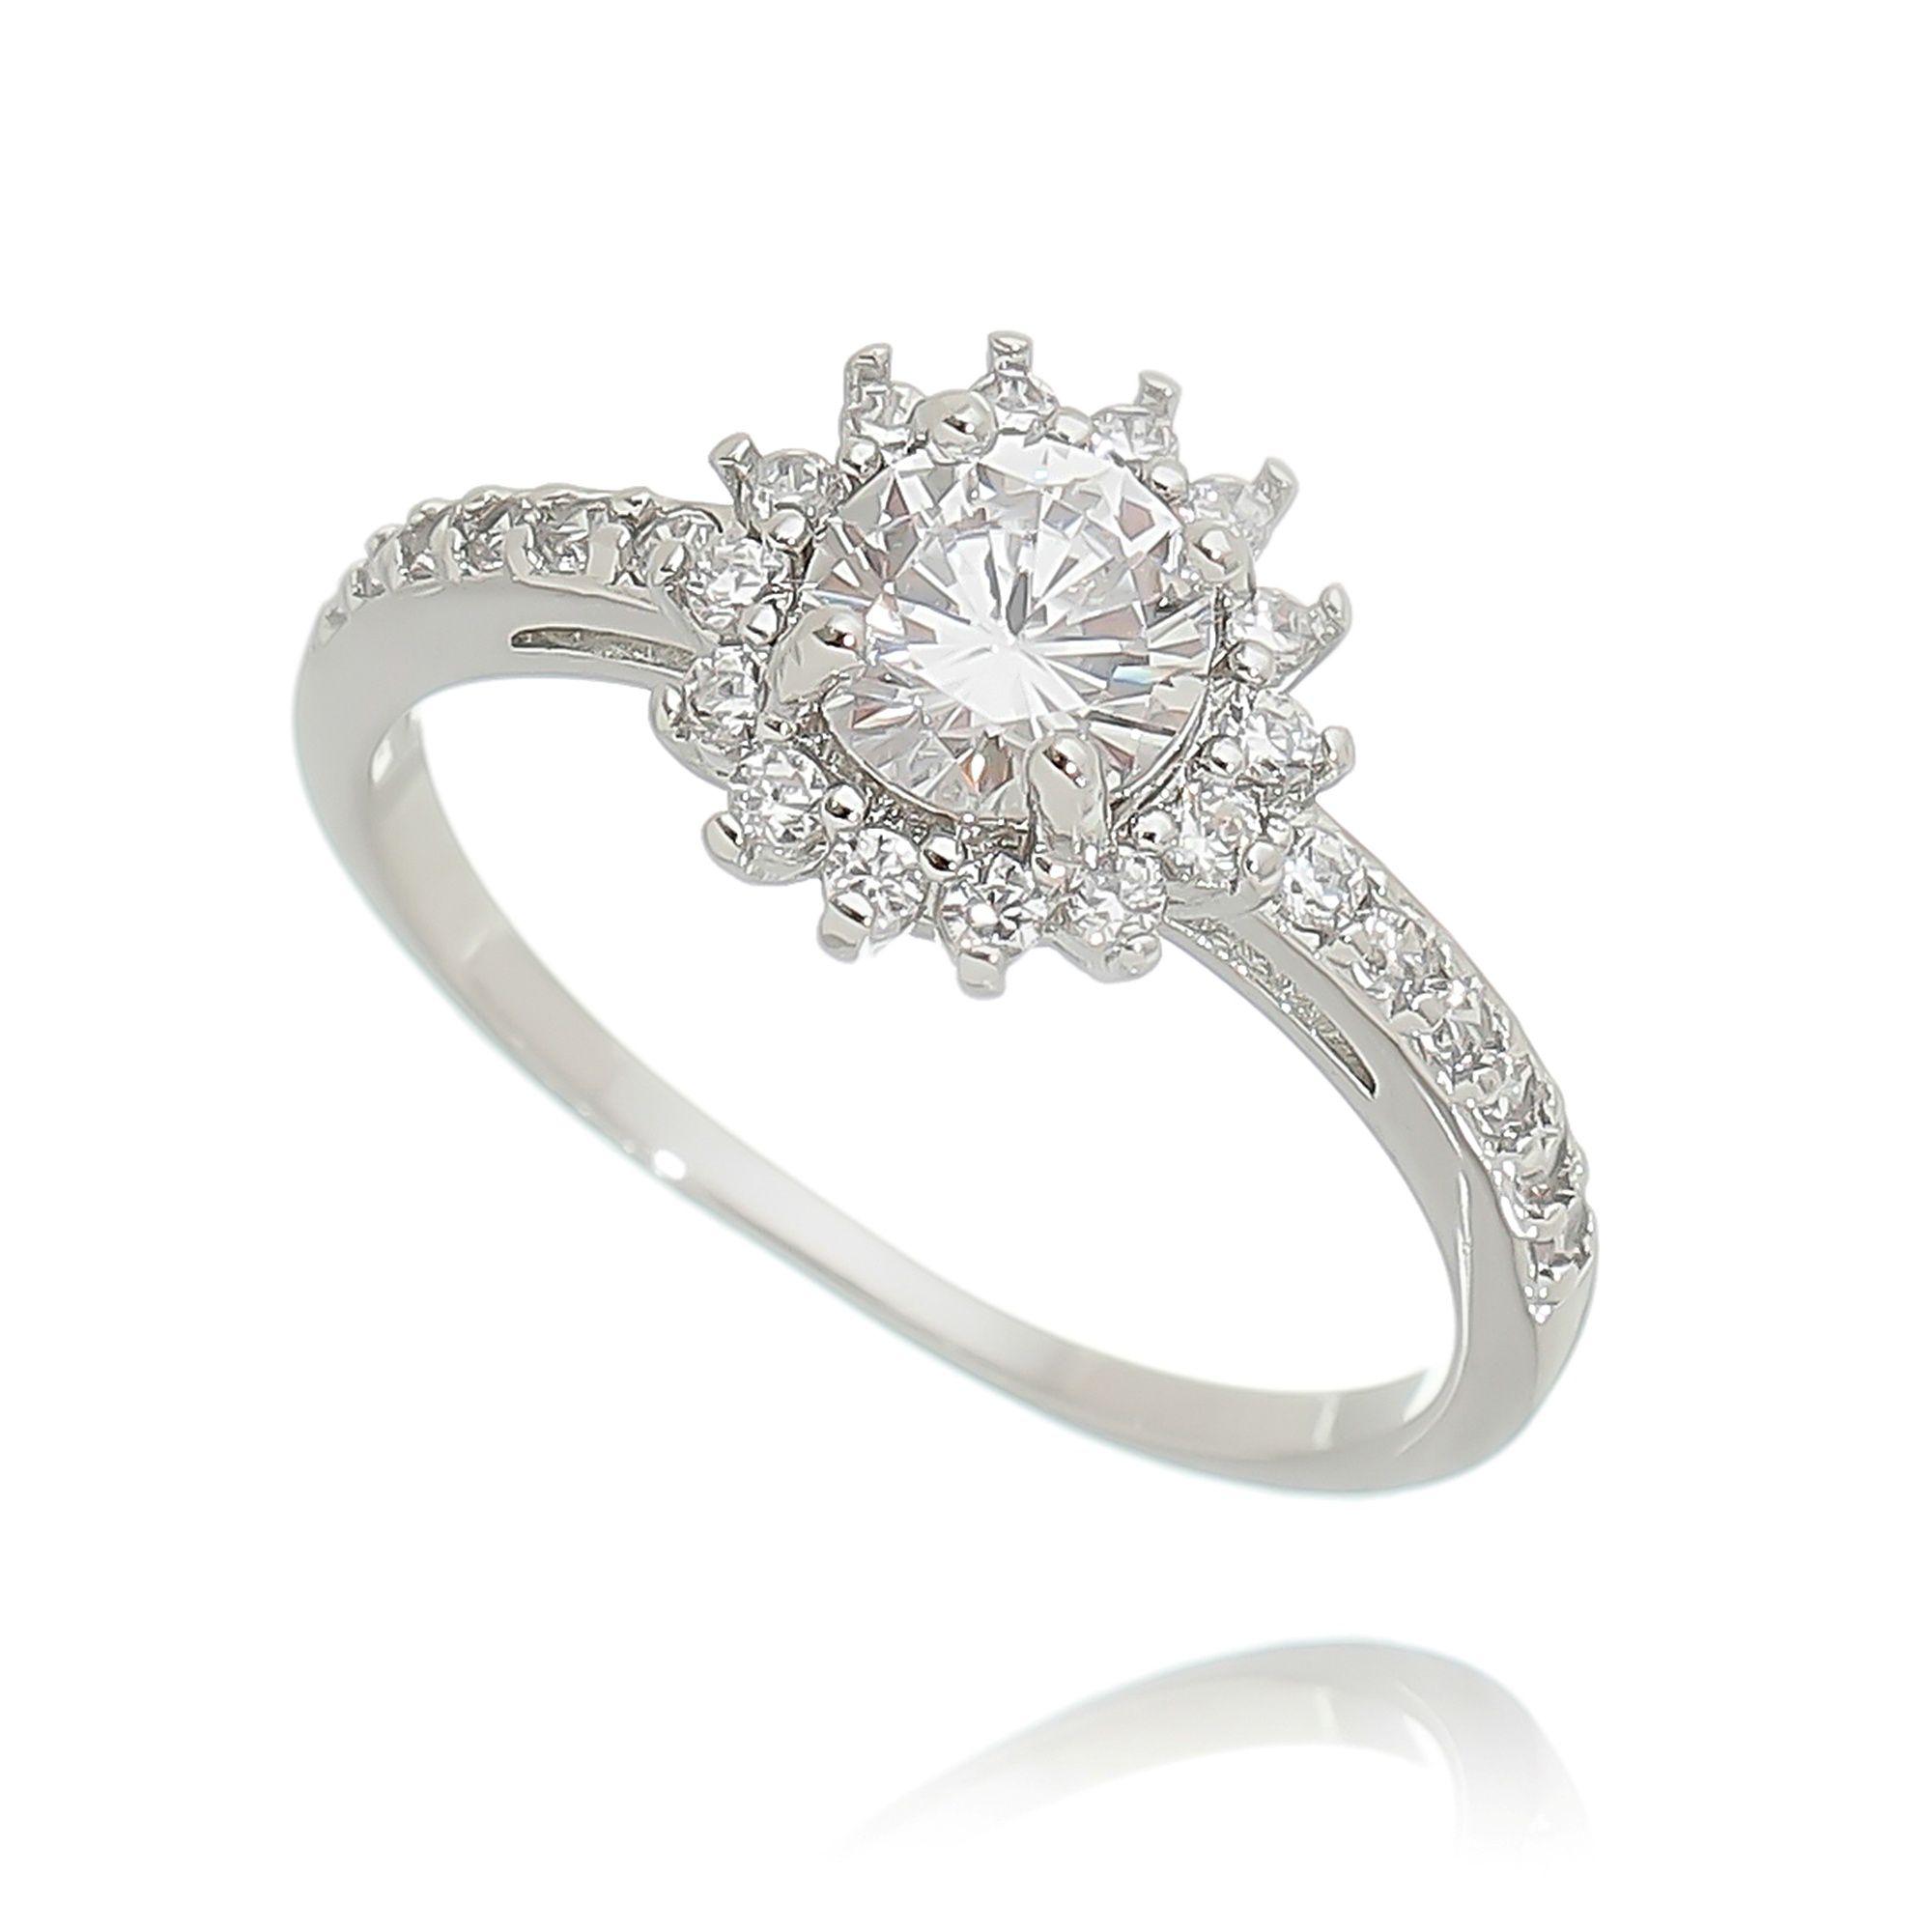 Anel Chuveirinho Zircônia Cristal Semijoia Ródio Branco  - Soloyou